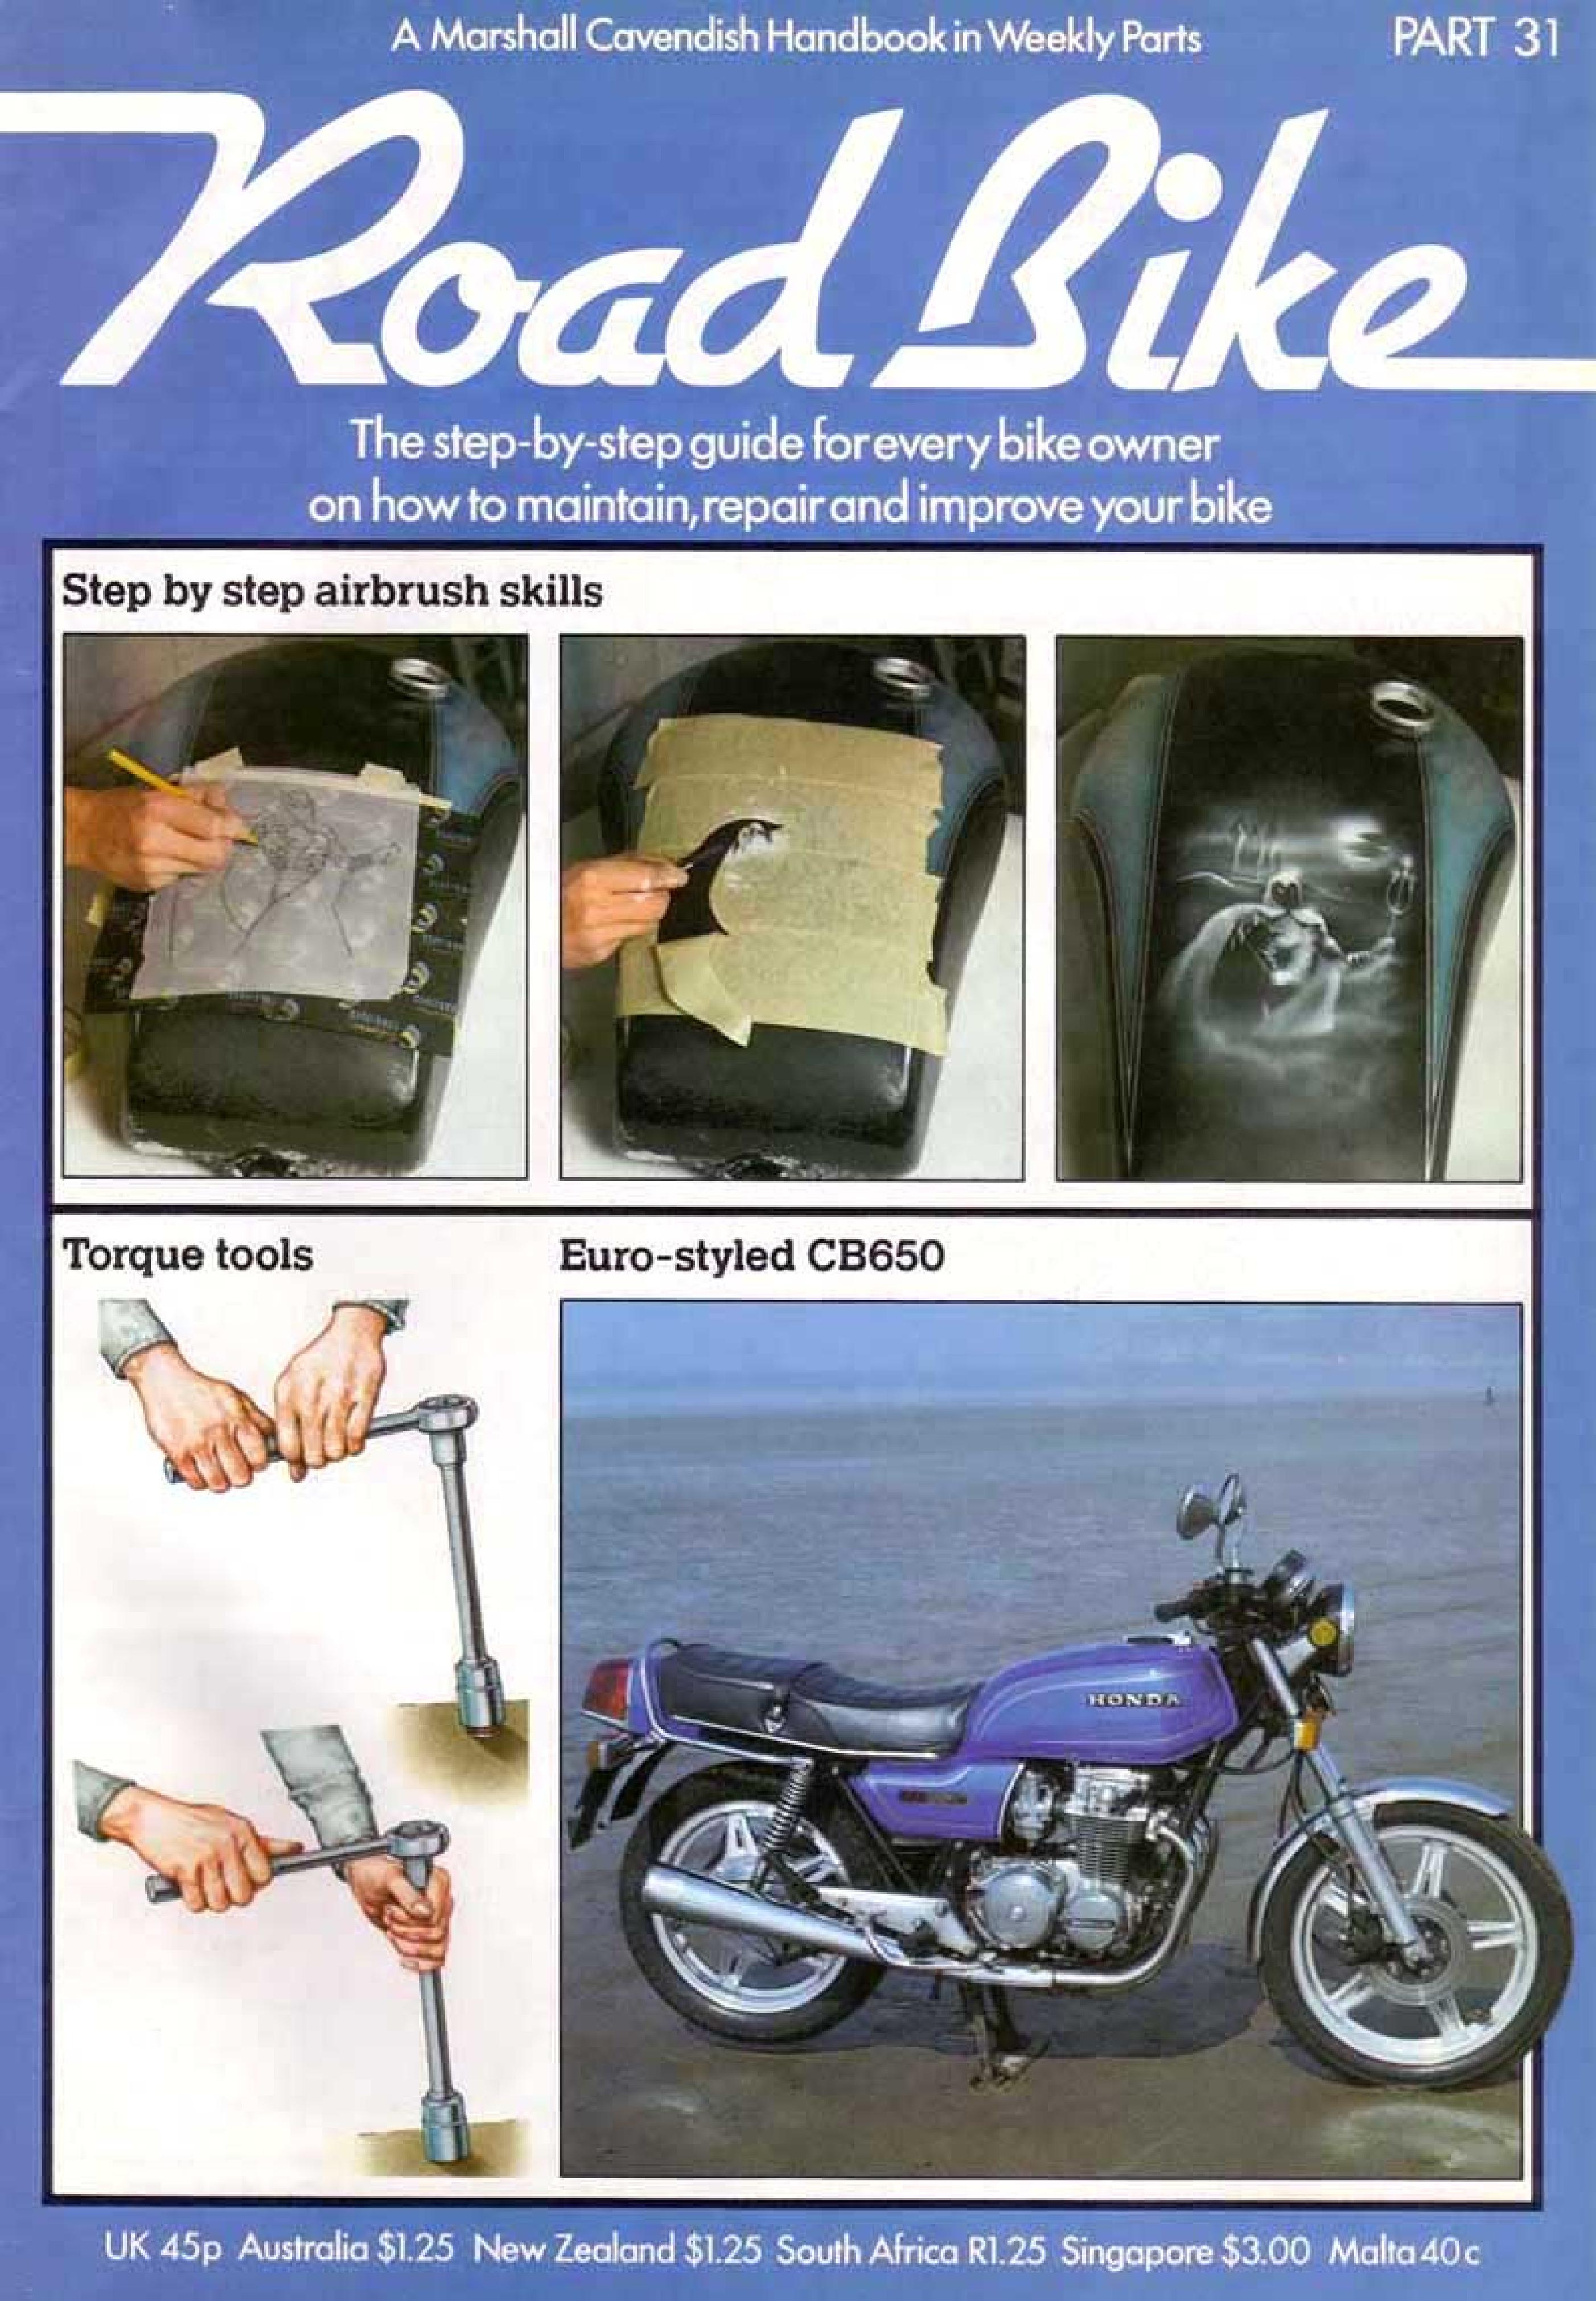 Road Bike Magazine about Honda CB650 (Part 31)